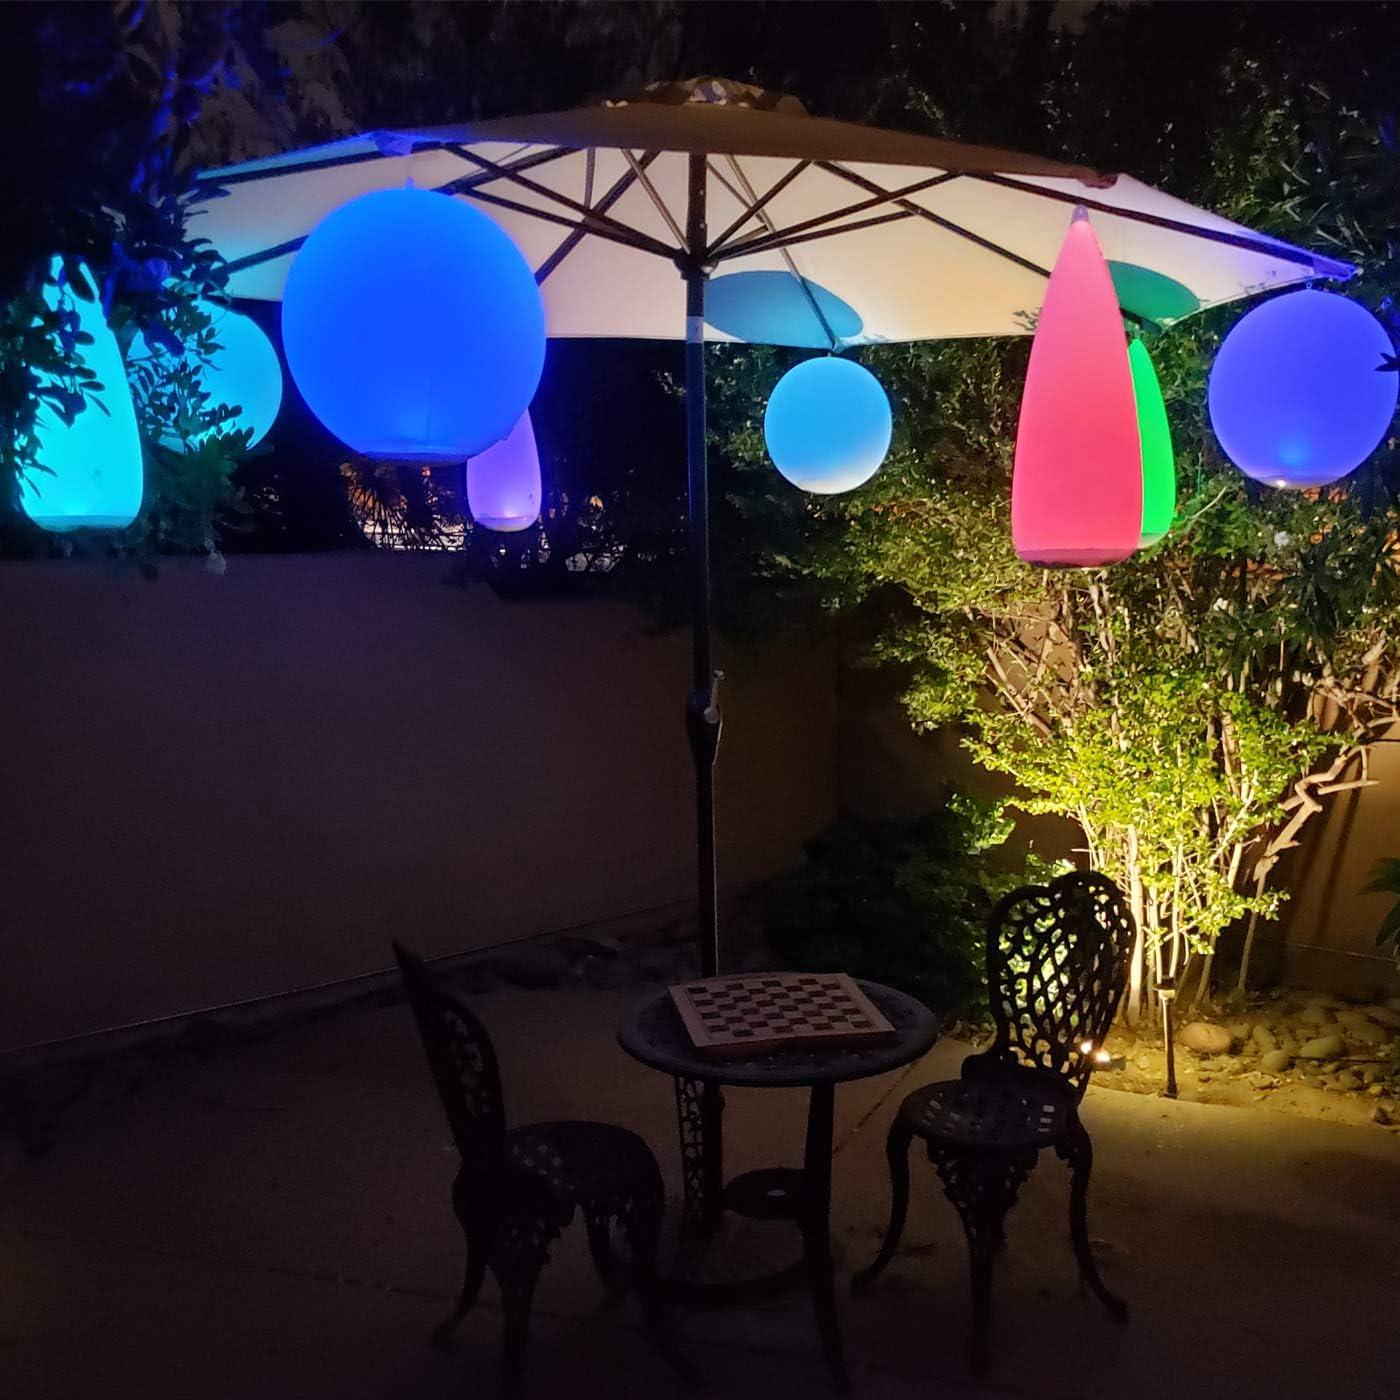 Lumi/ères ext/érieures de jardin de LED Lumi/ères solaires coniques de lumi/ères ext/érieures Jardin Lumi/ères solaires de LED de jardin solaire Lumi/ères ext/érieures de jardin de piscine IP68 imperm/é